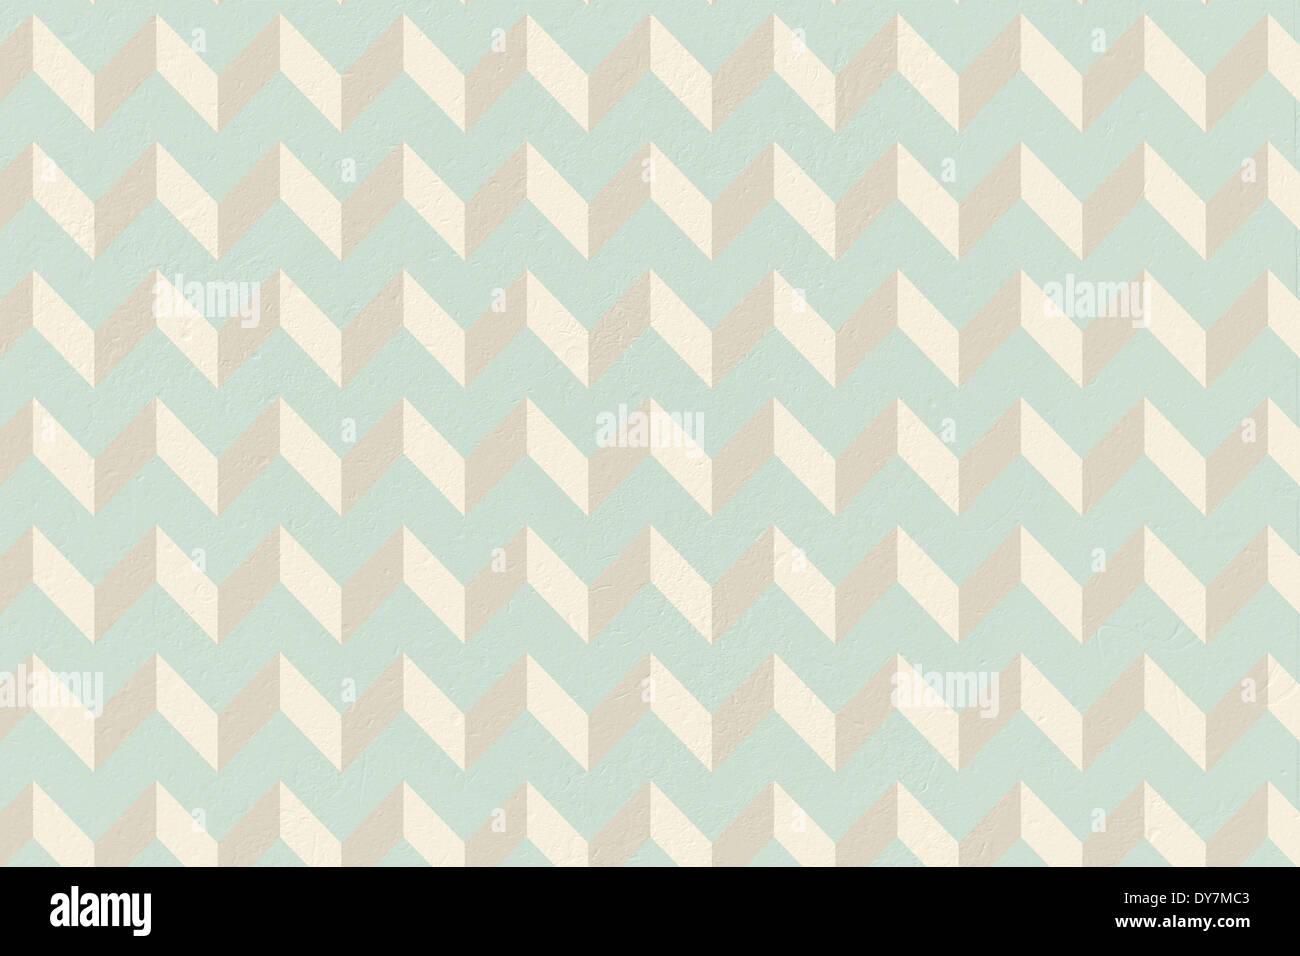 Blu e crema, carta da parati con motivi geometrici Immagini Stock